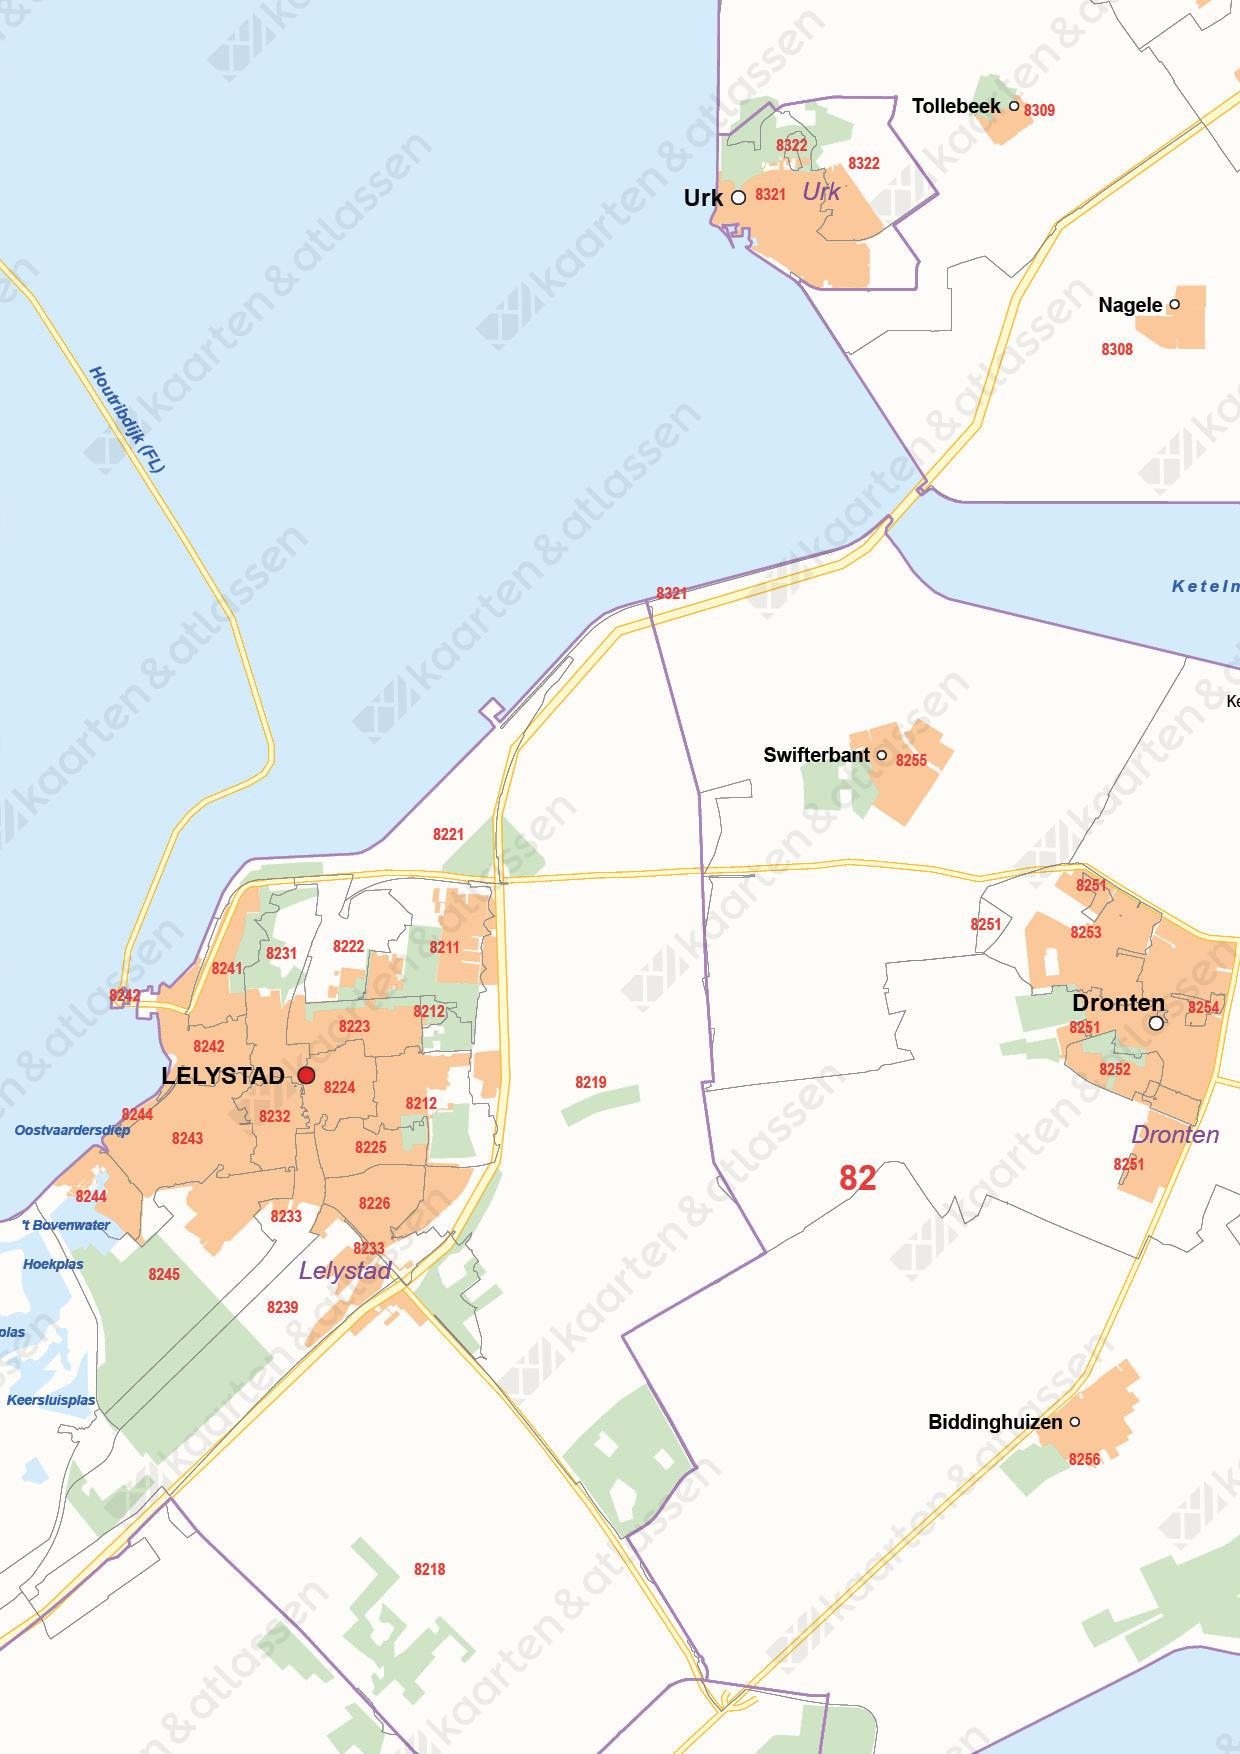 Digitale Postcode-/Gemeentekaart Flevoland